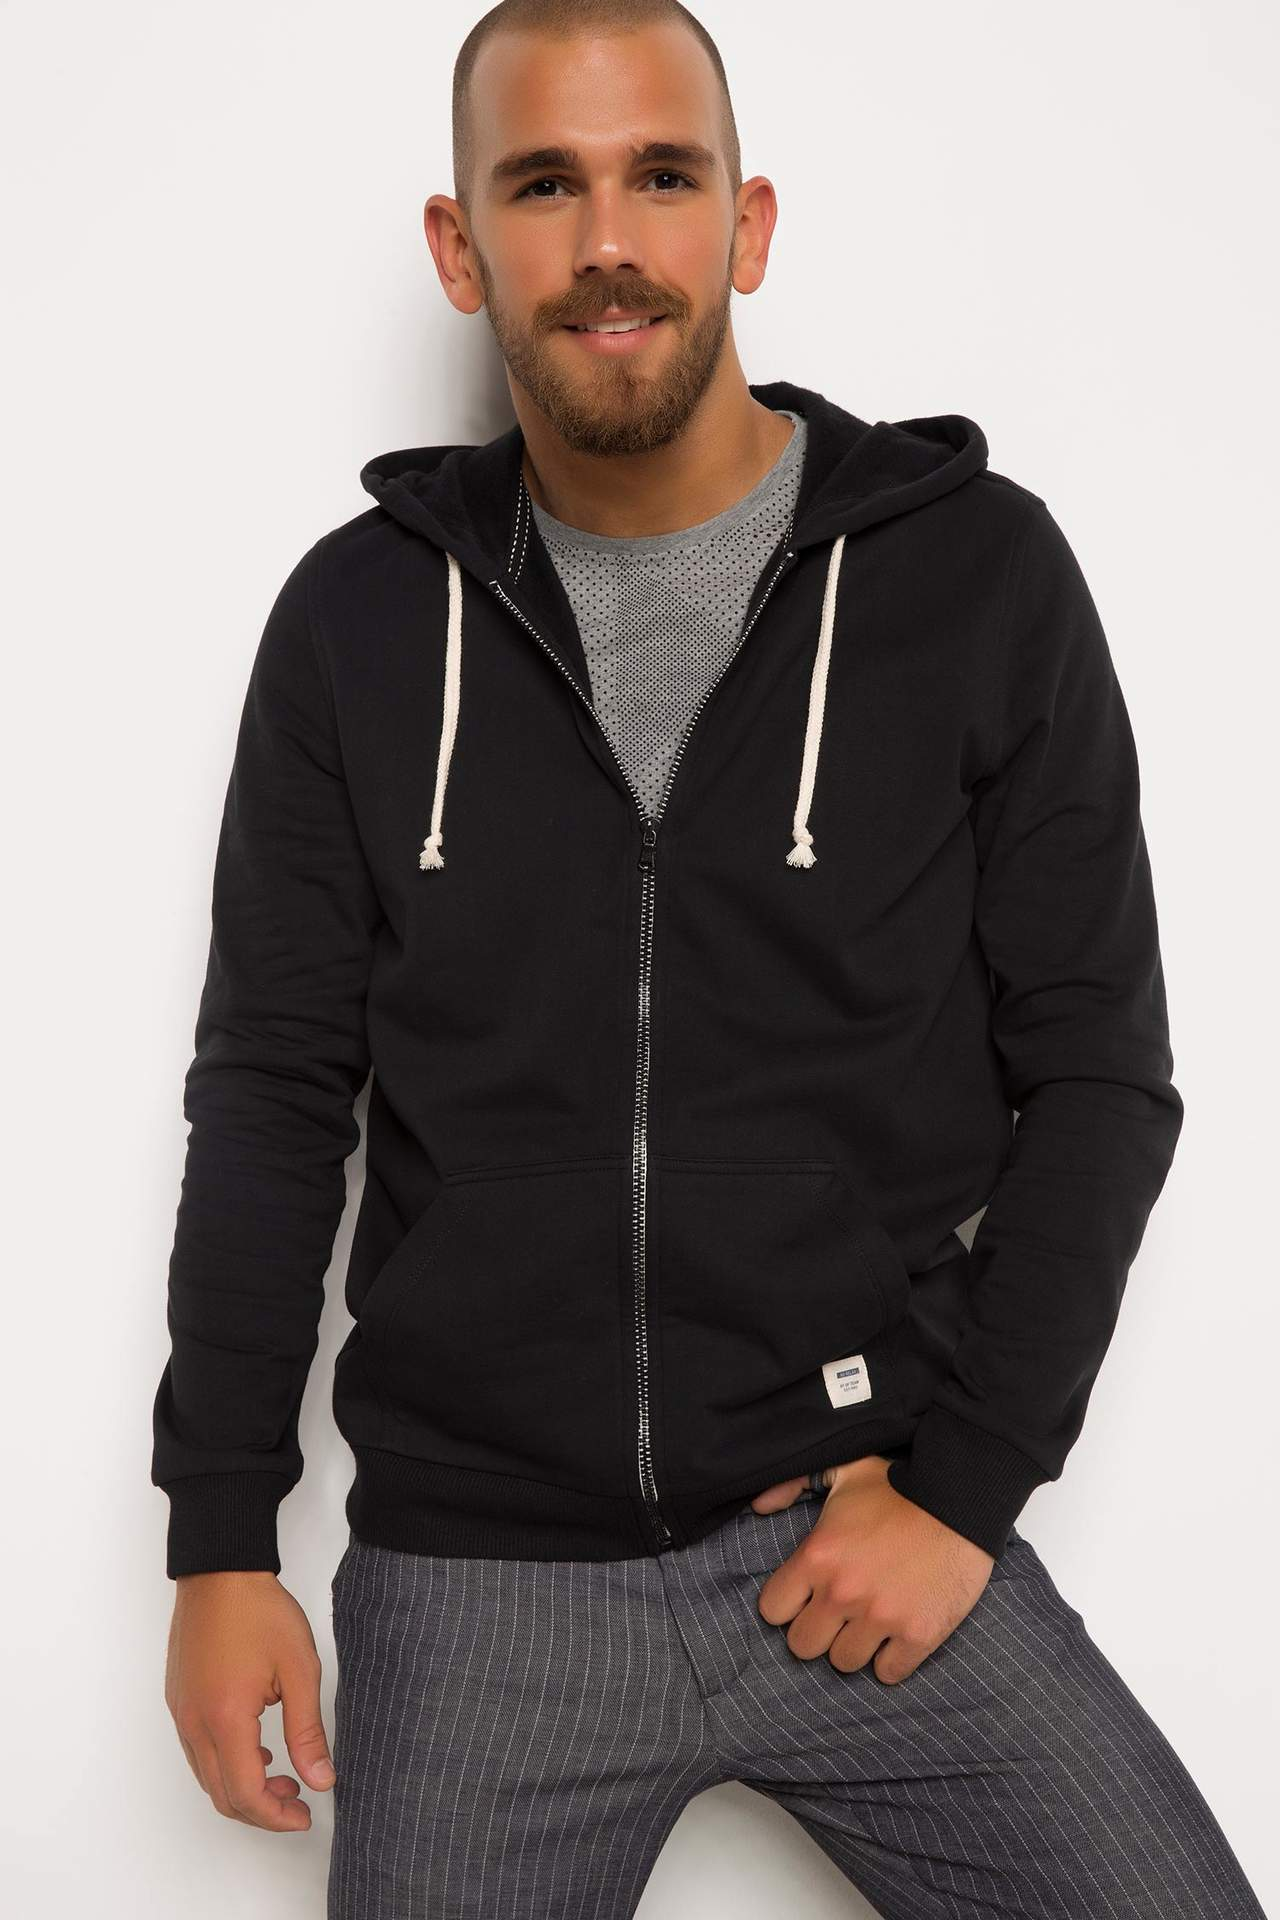 Basic Kapşonlu Sweatshirt Hırka